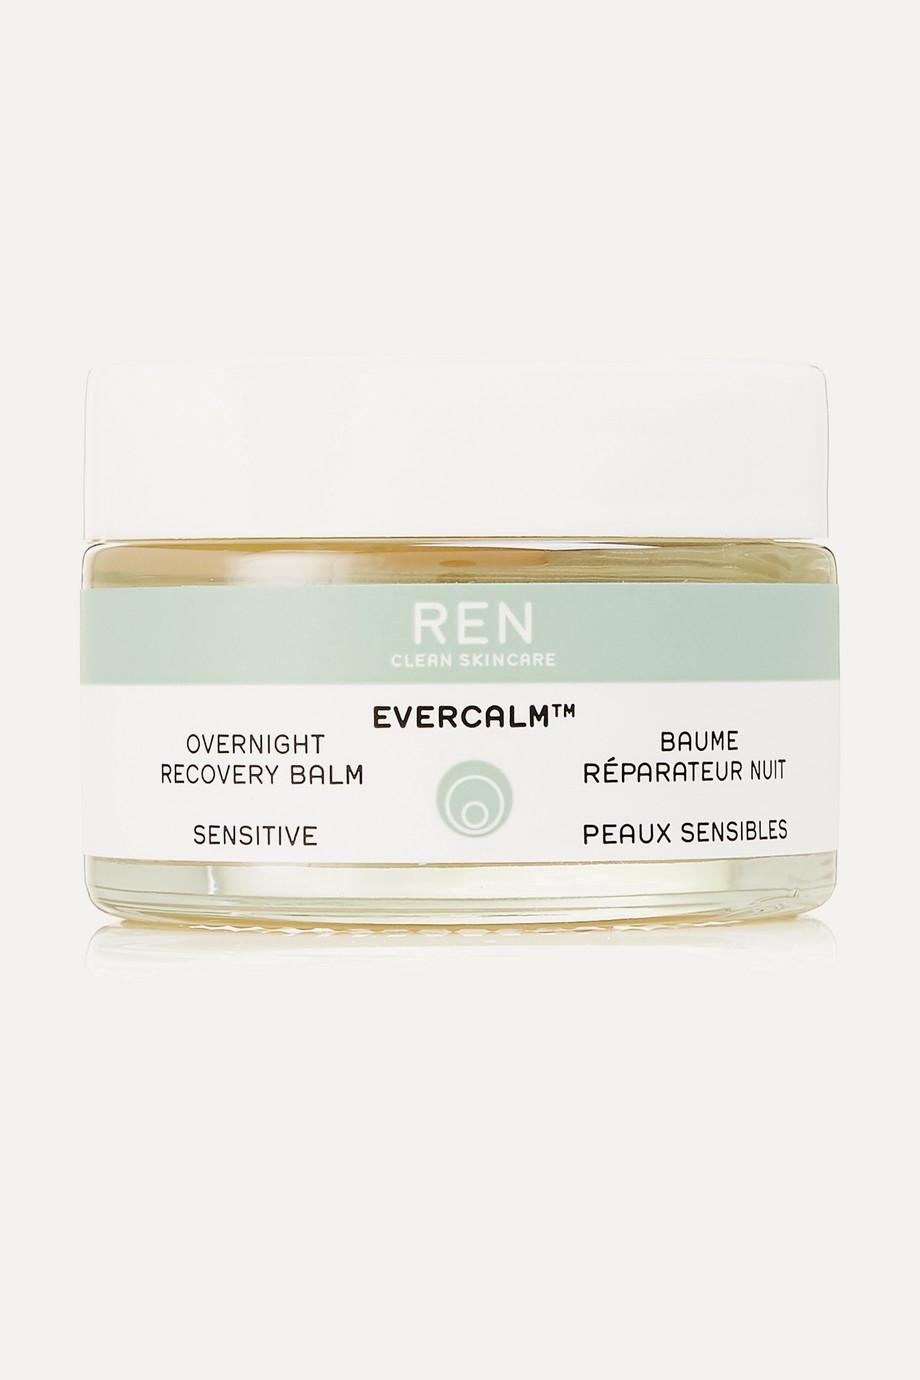 REN Clean Skincare Evercalm™ Overnight Recovery Balm, 30ml